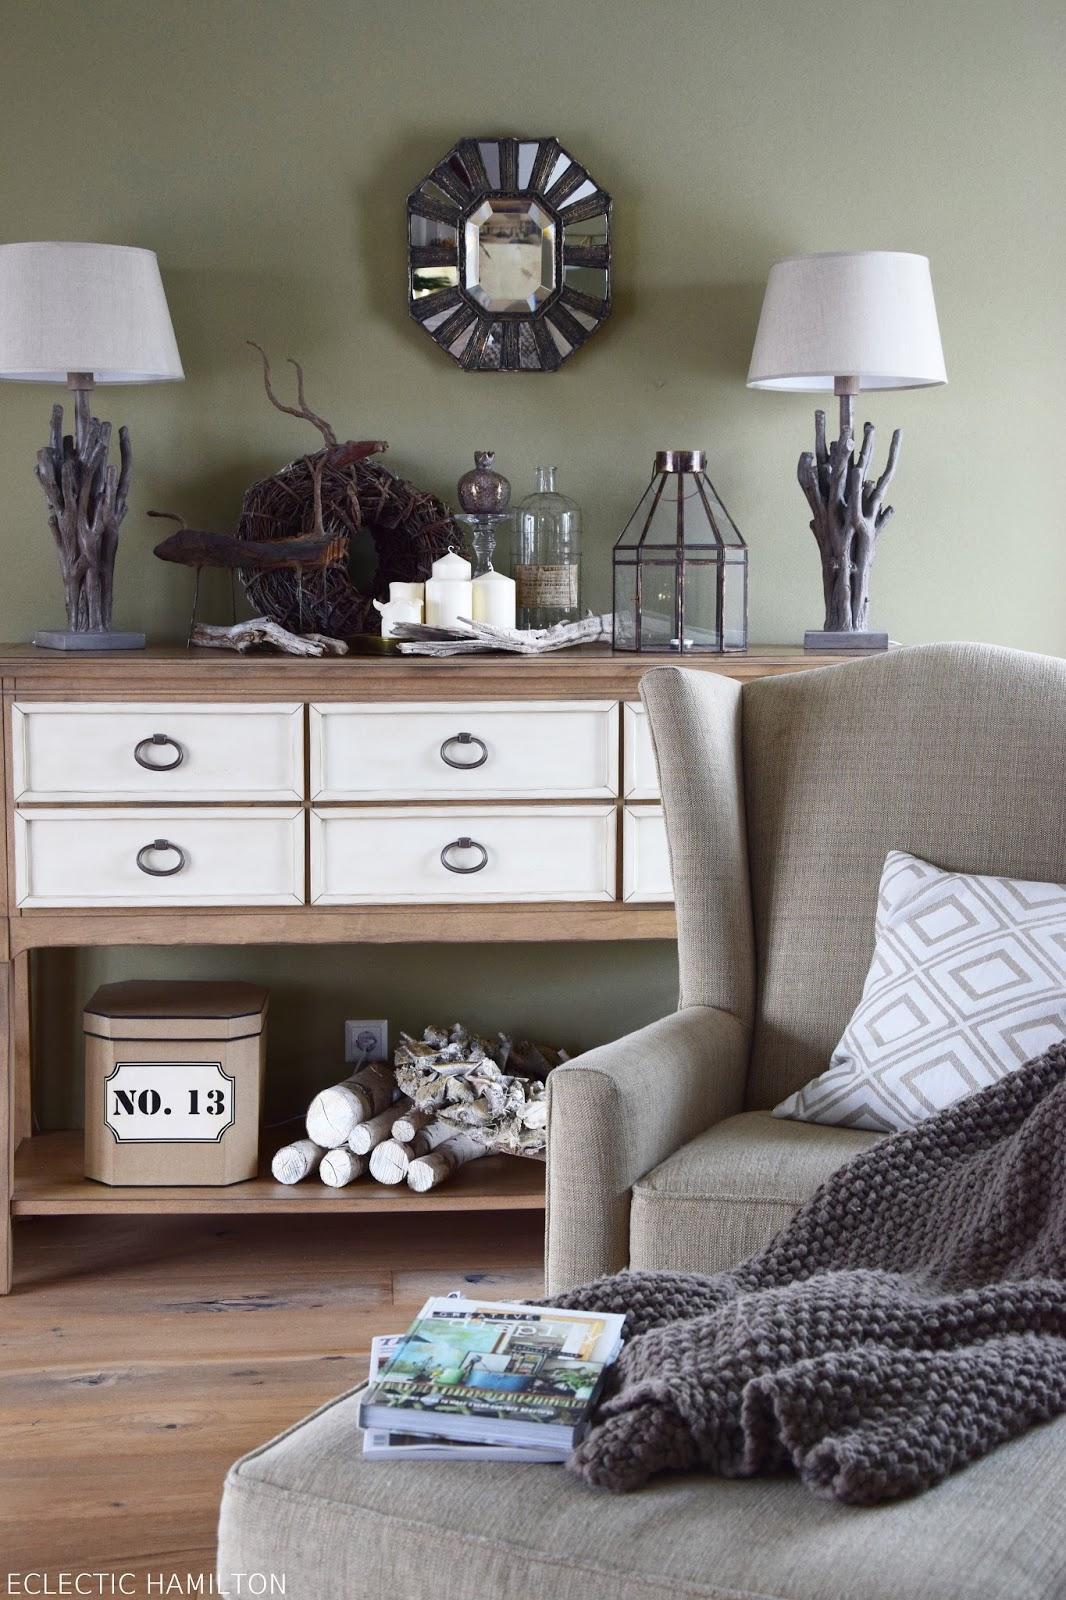 deko ideen winter schlafzimmer. Black Bedroom Furniture Sets. Home Design Ideas